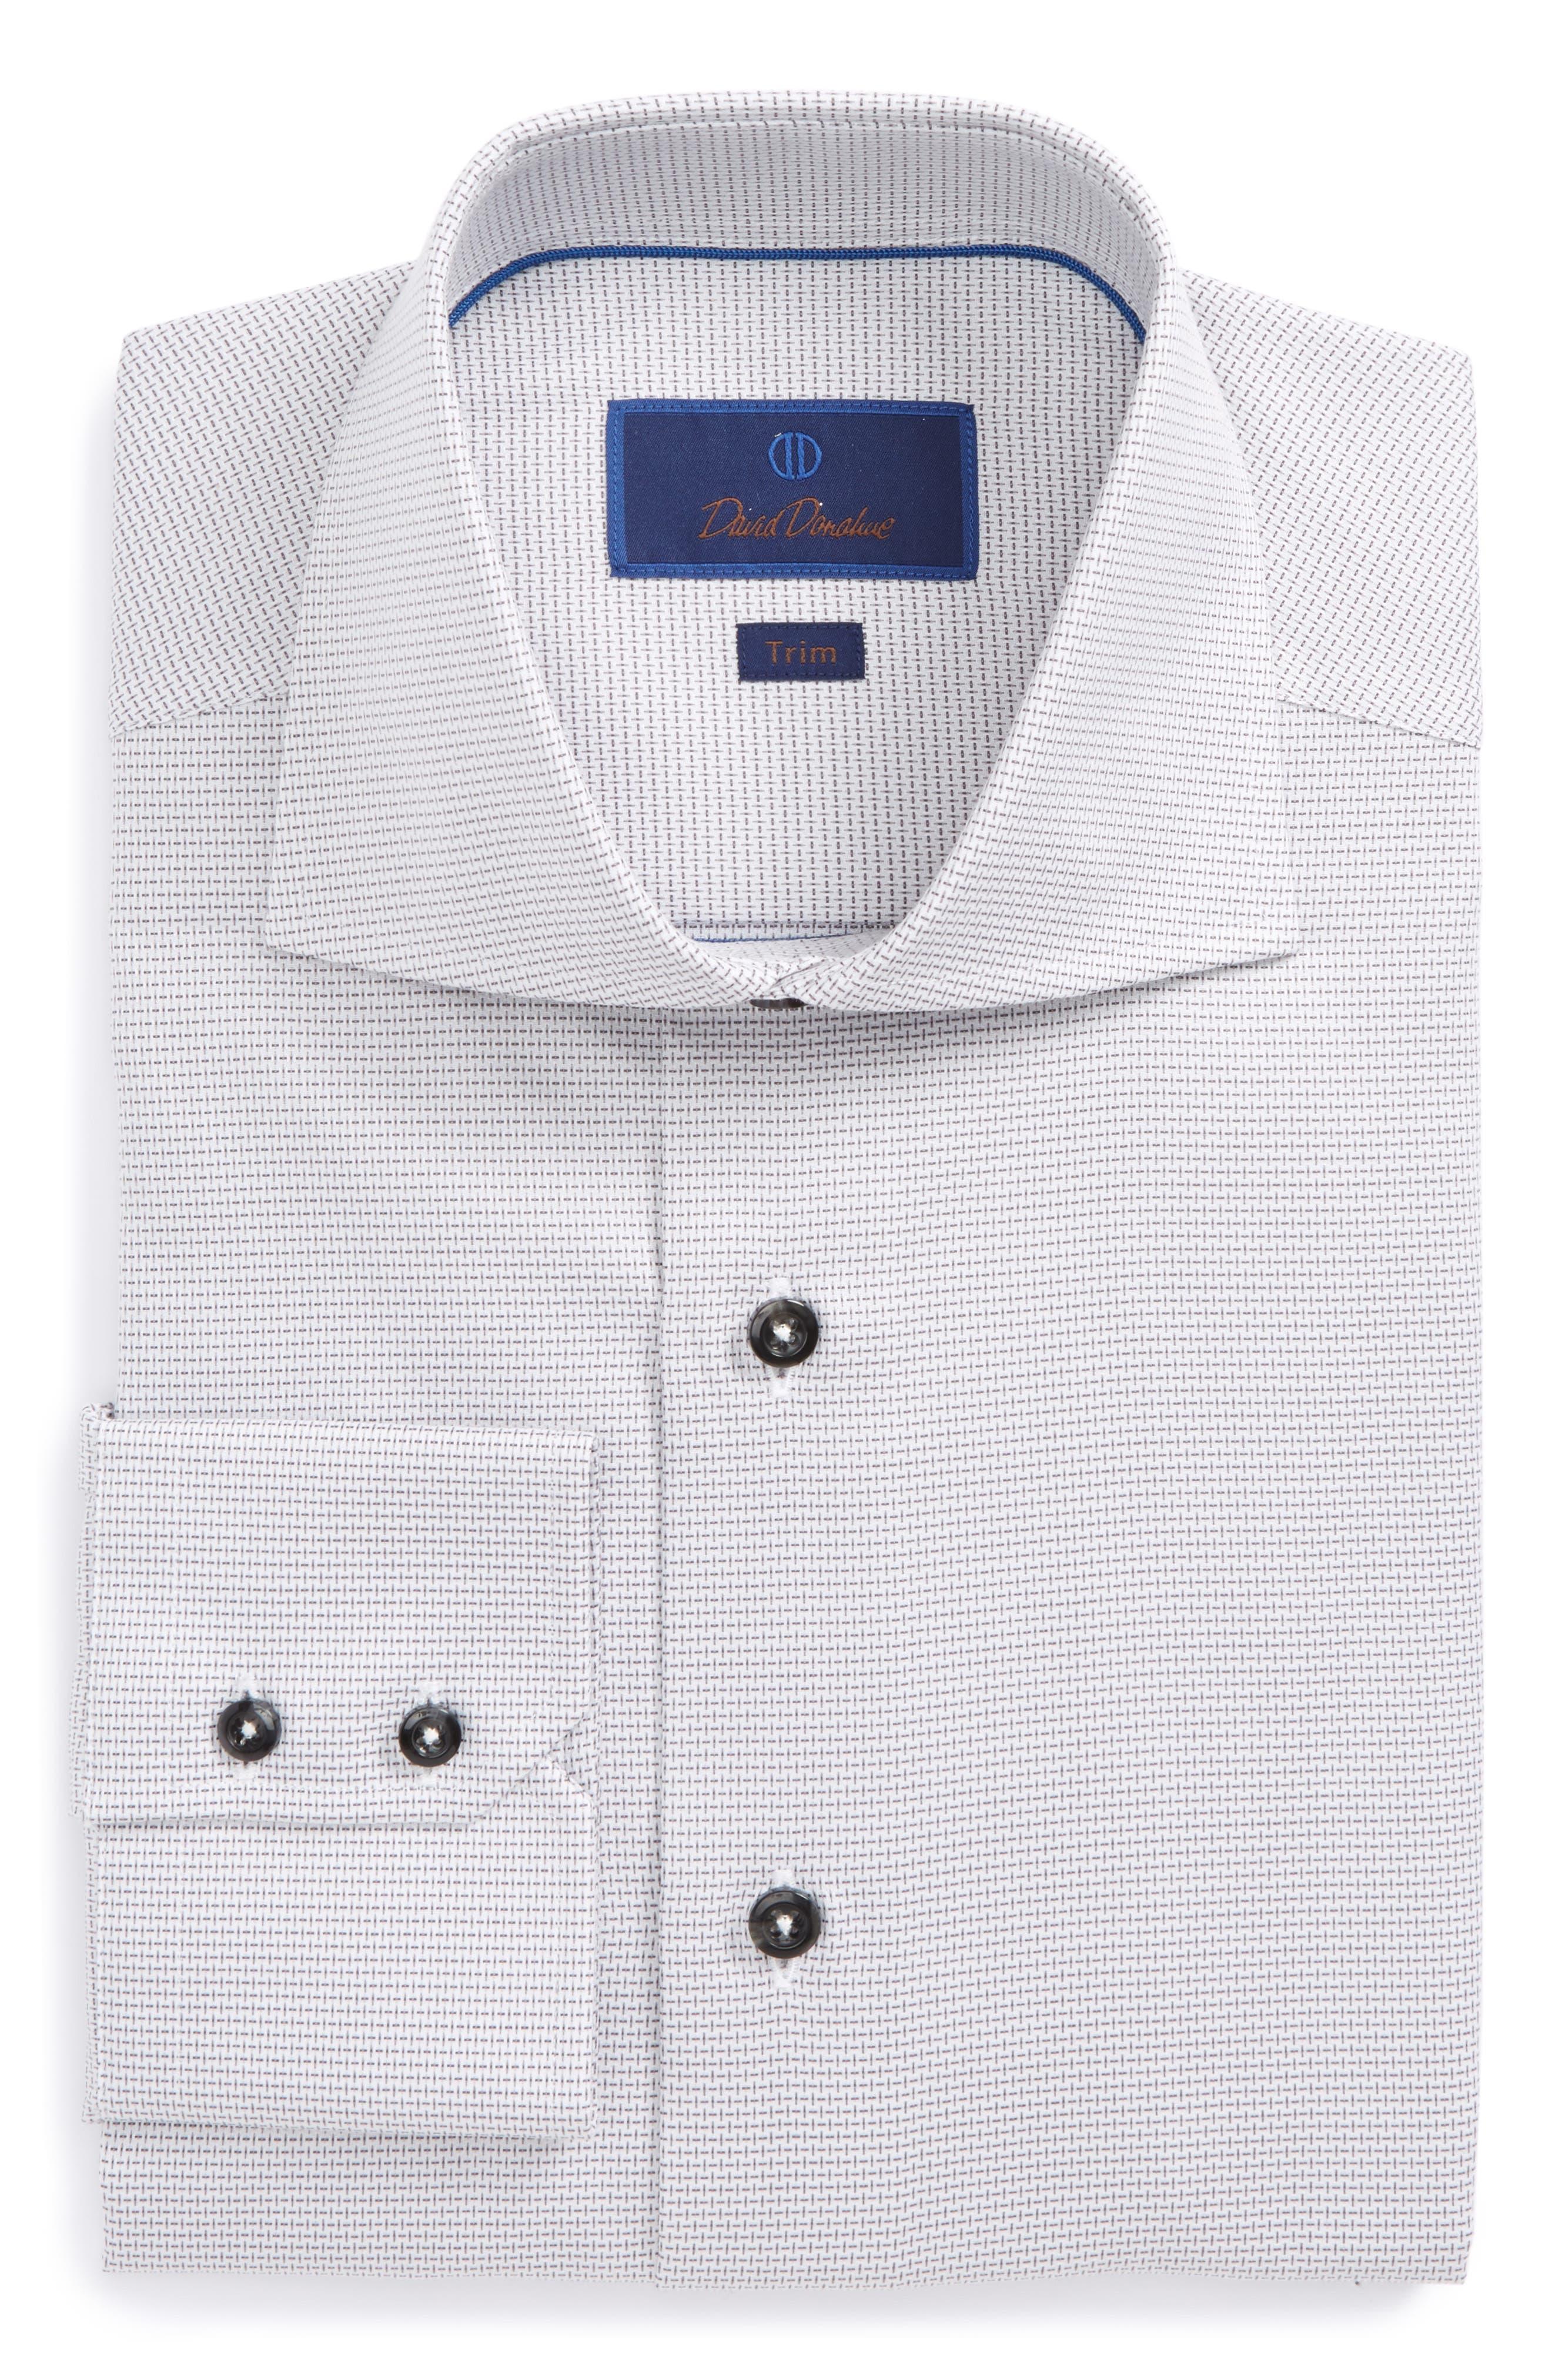 Trim Fit Patterned Dress Shirt,                             Main thumbnail 1, color,                             020